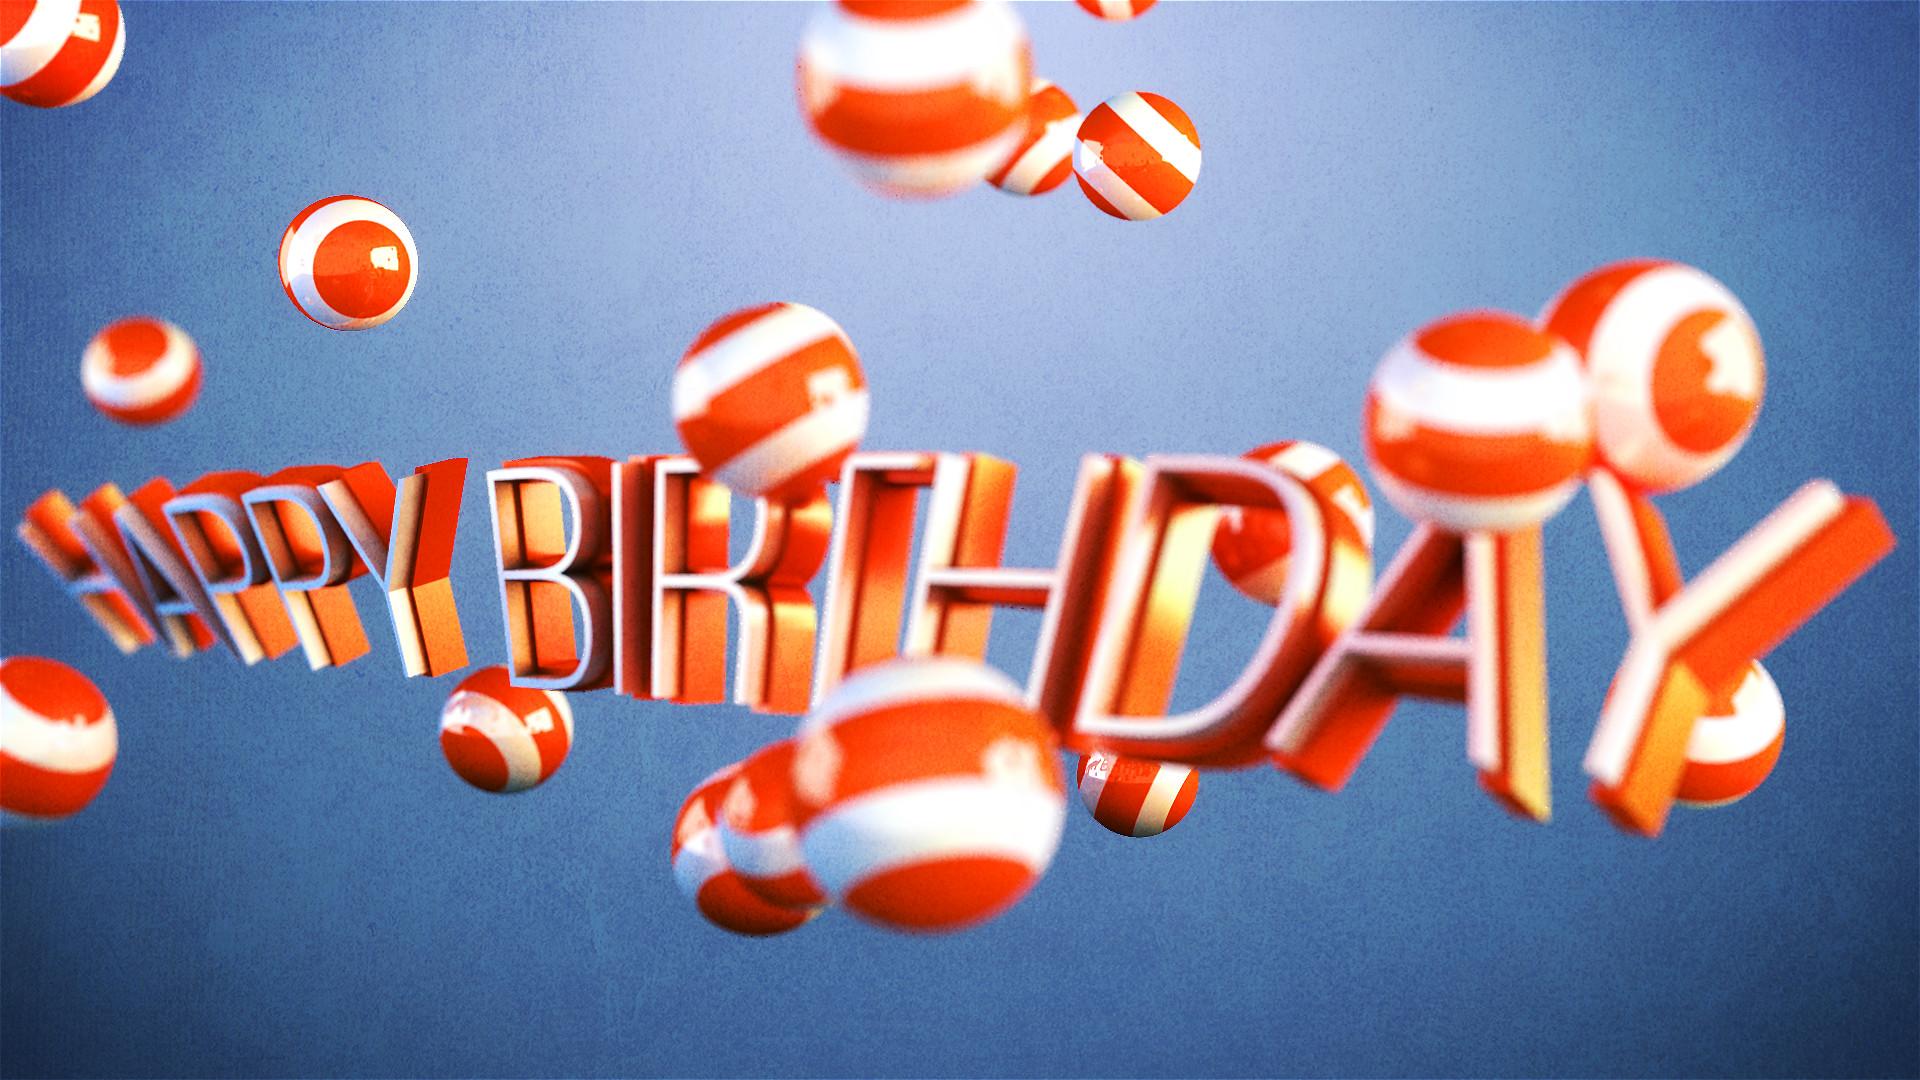 Happy Birthday HD 3D Wallpaper